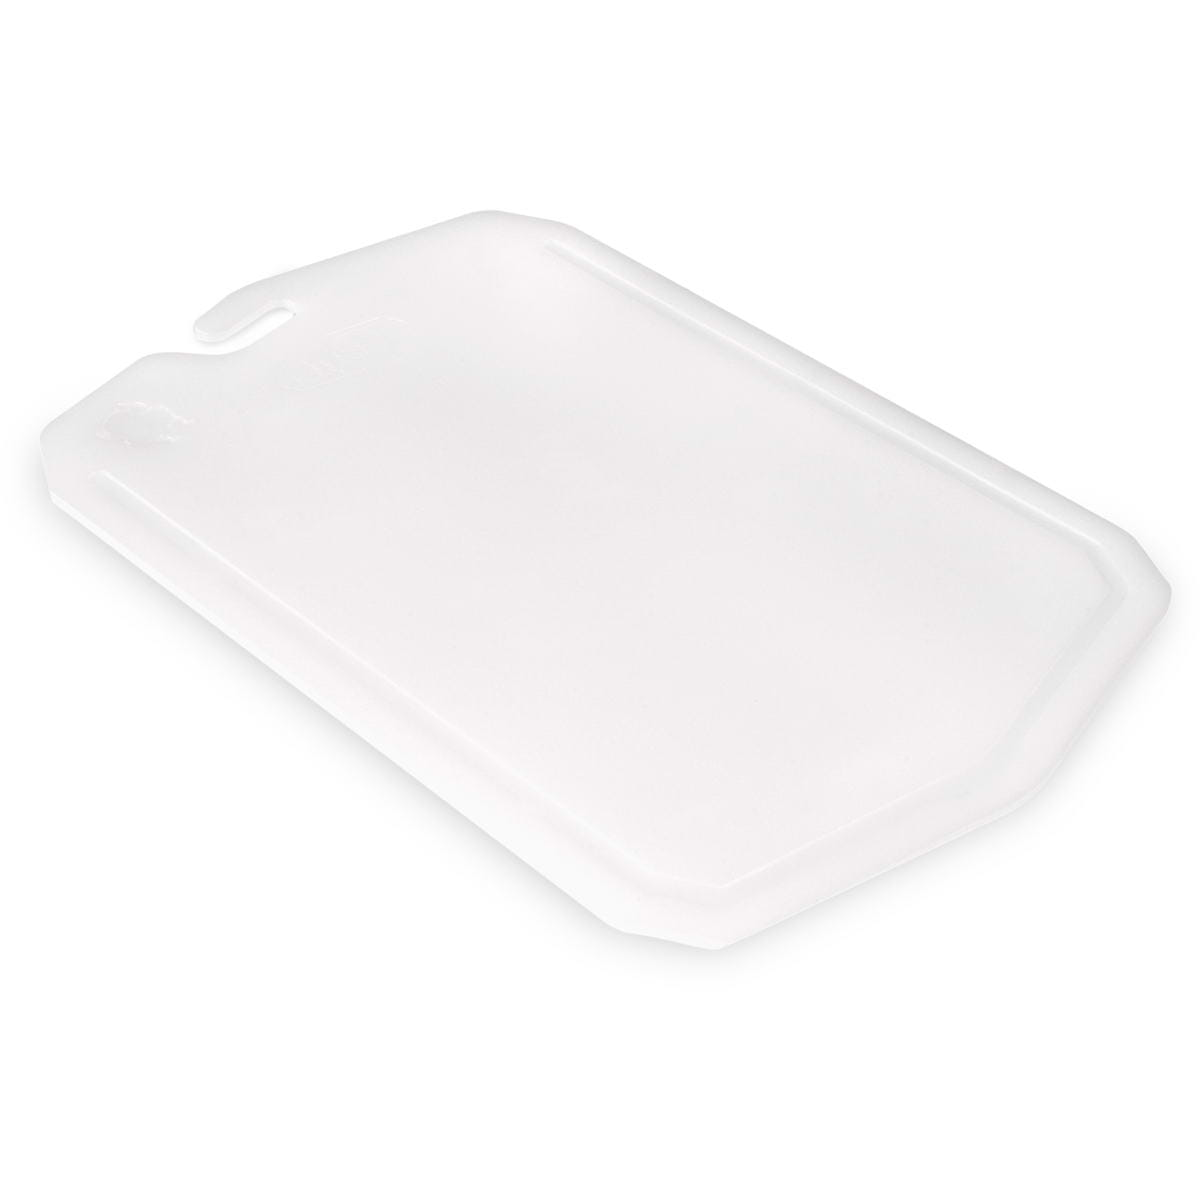 GSI Ultralight Cutting Board Small - Schneibrett - Bild 1